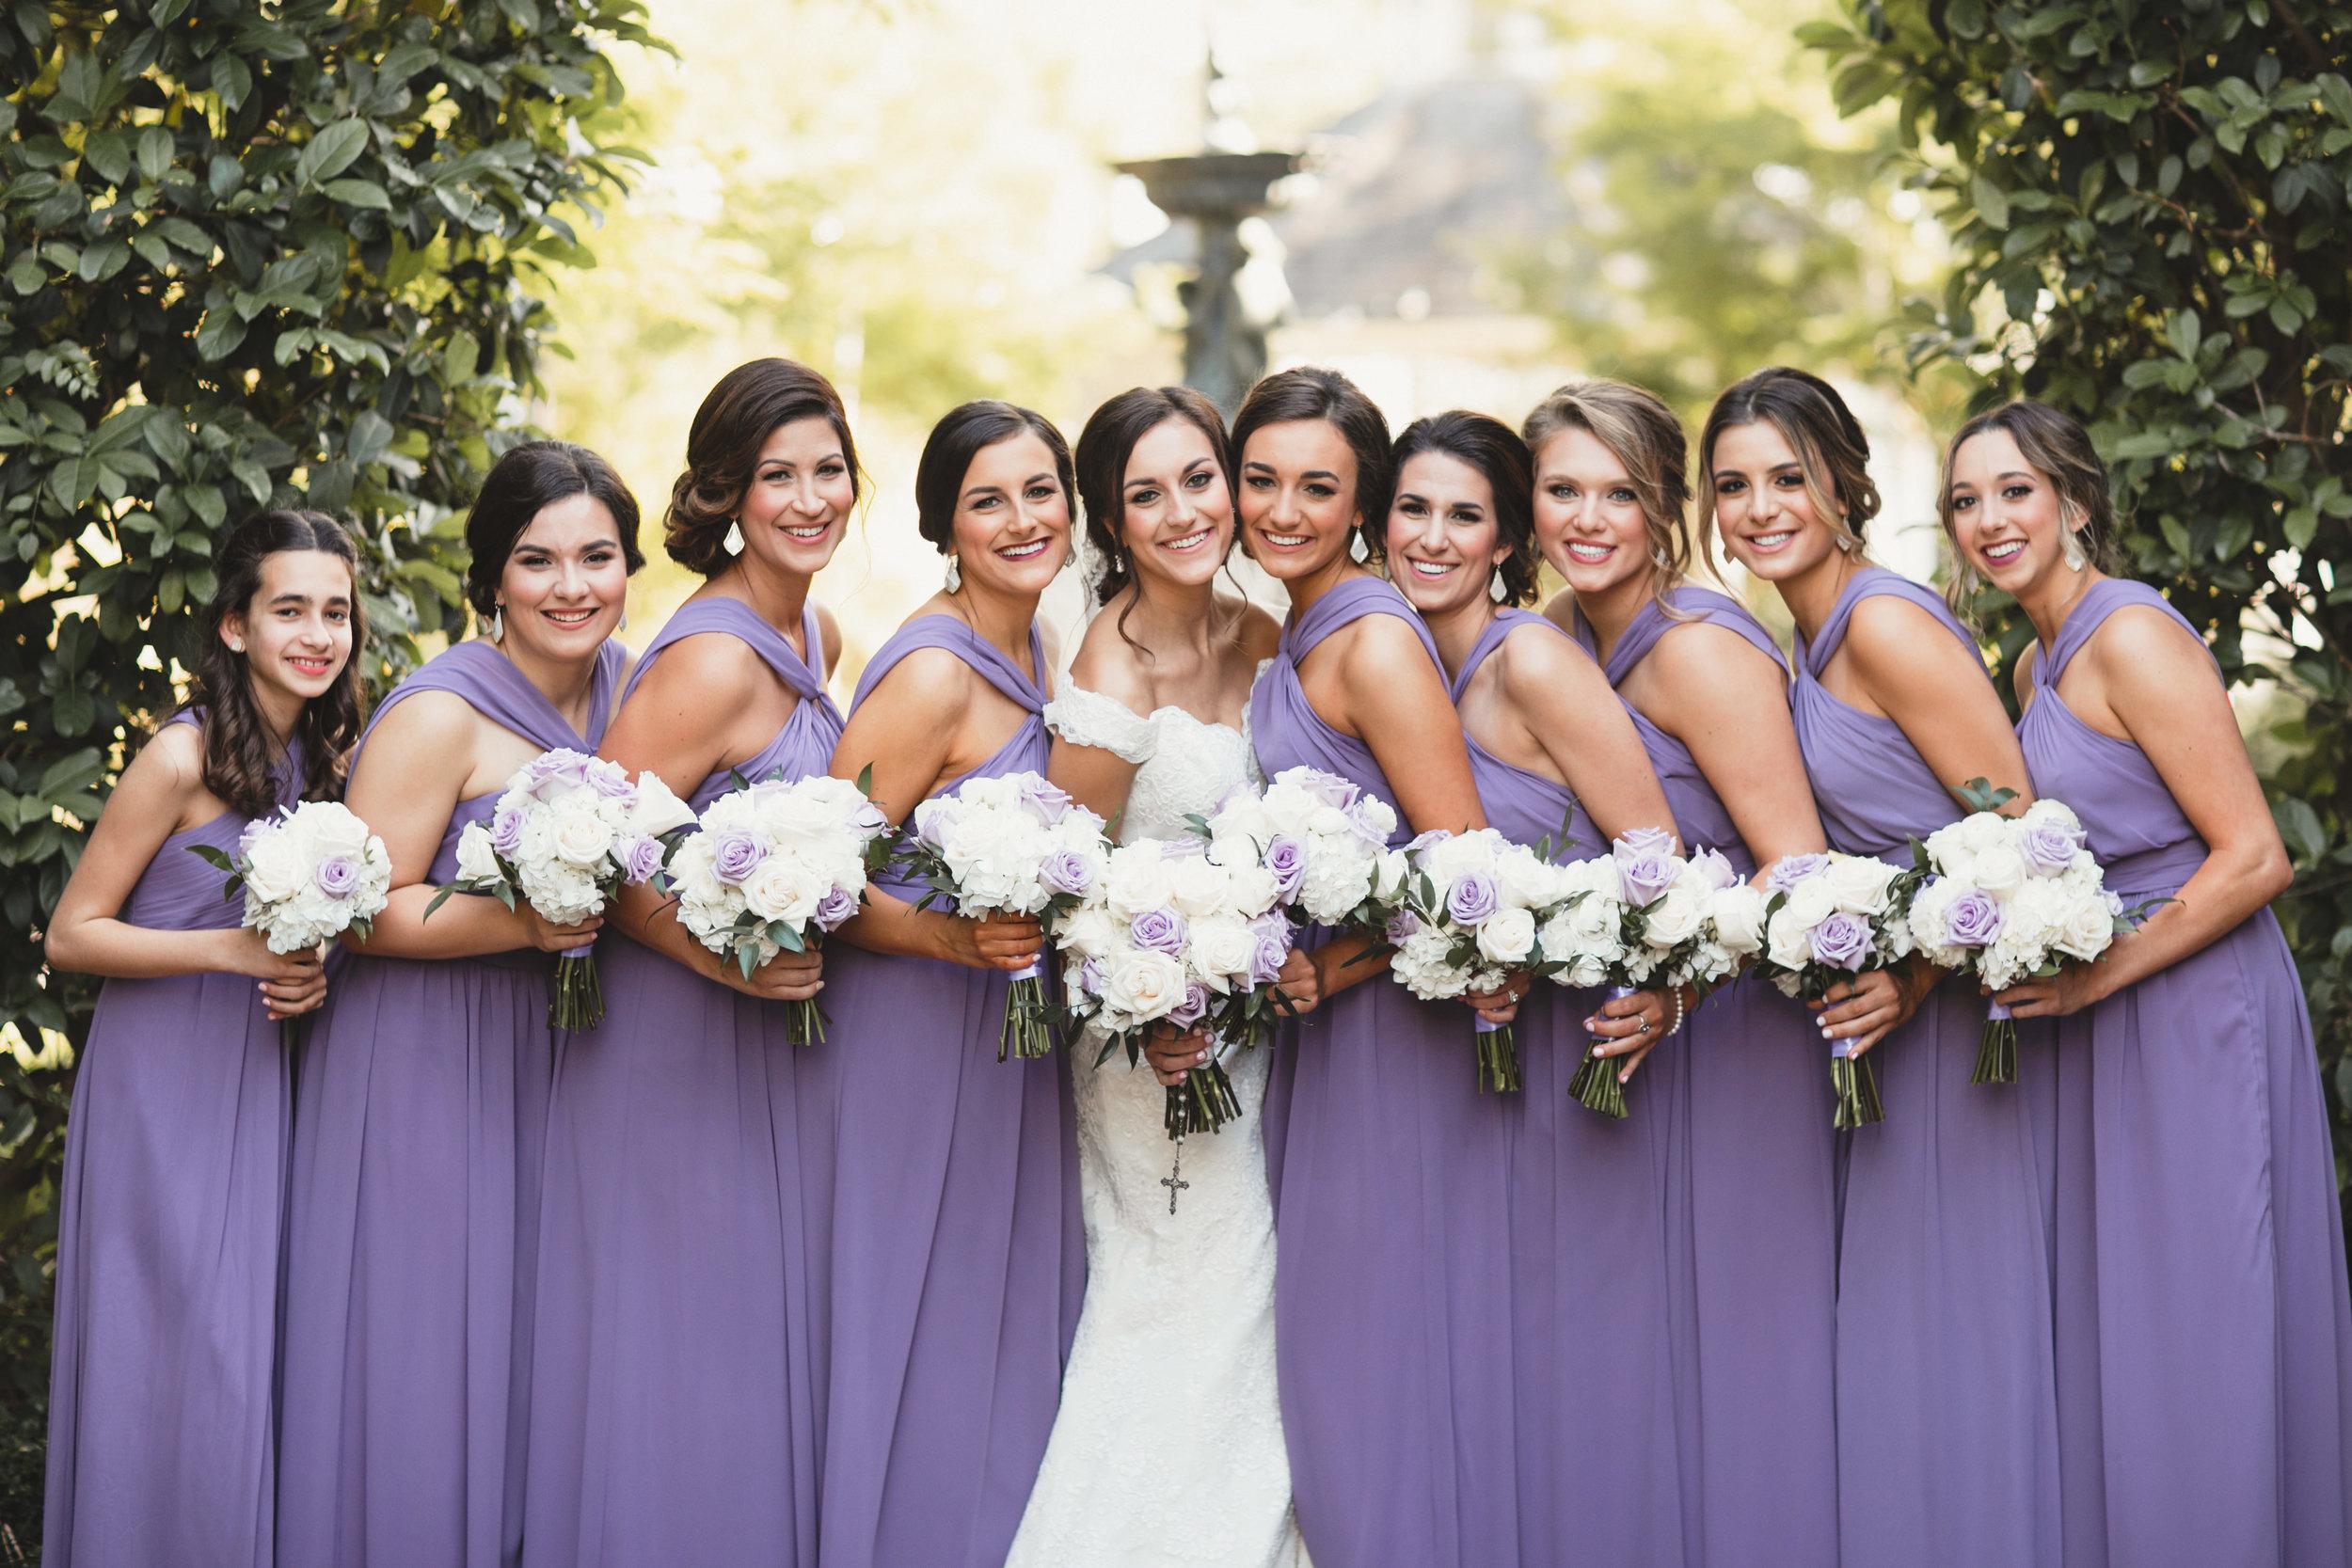 Citron_Bergeron_wedding-0166.jpg